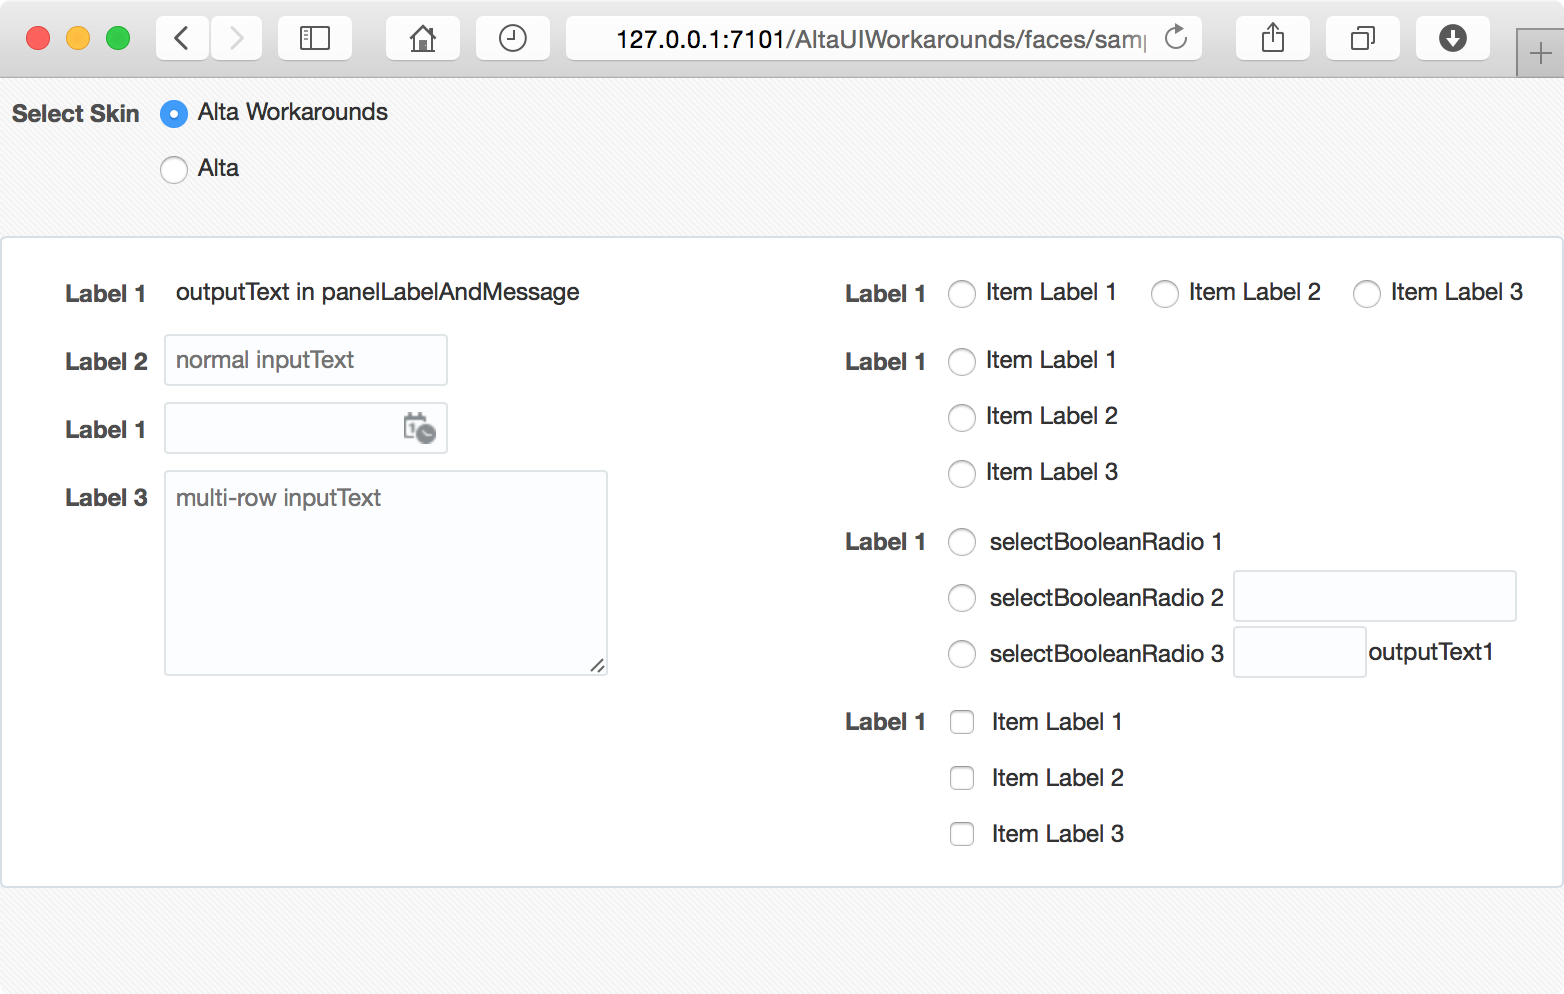 Image: panelFormLayout with Alta UI Workarounds